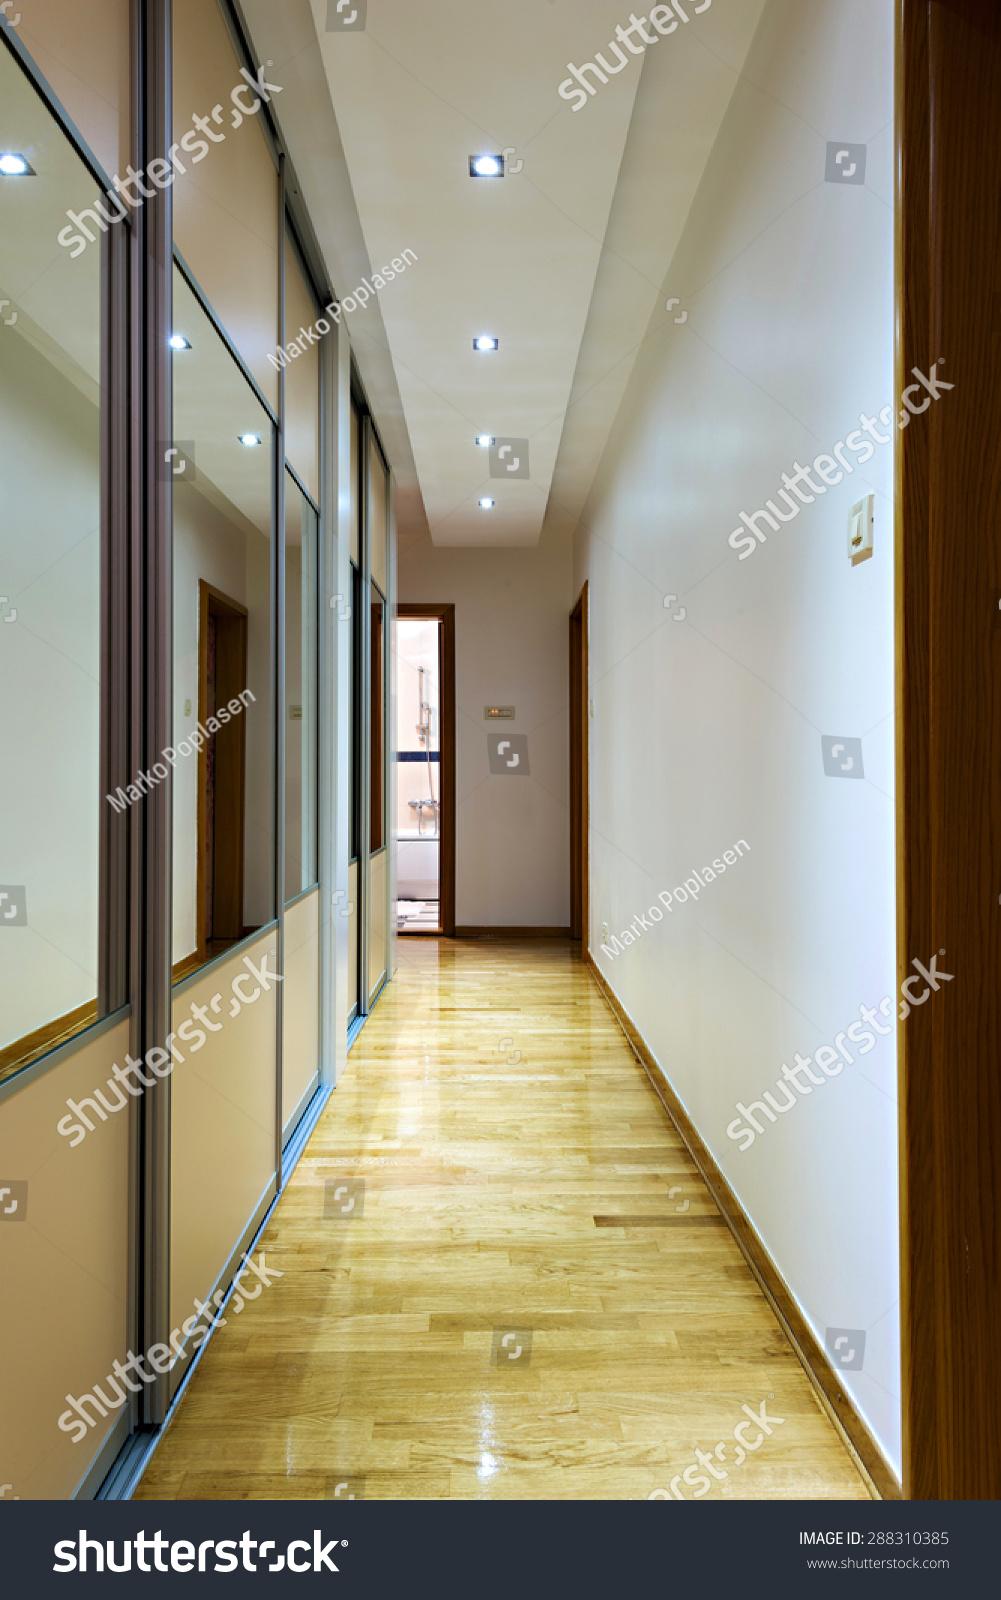 Indoor House Corridor With Closet With Sliding Doors